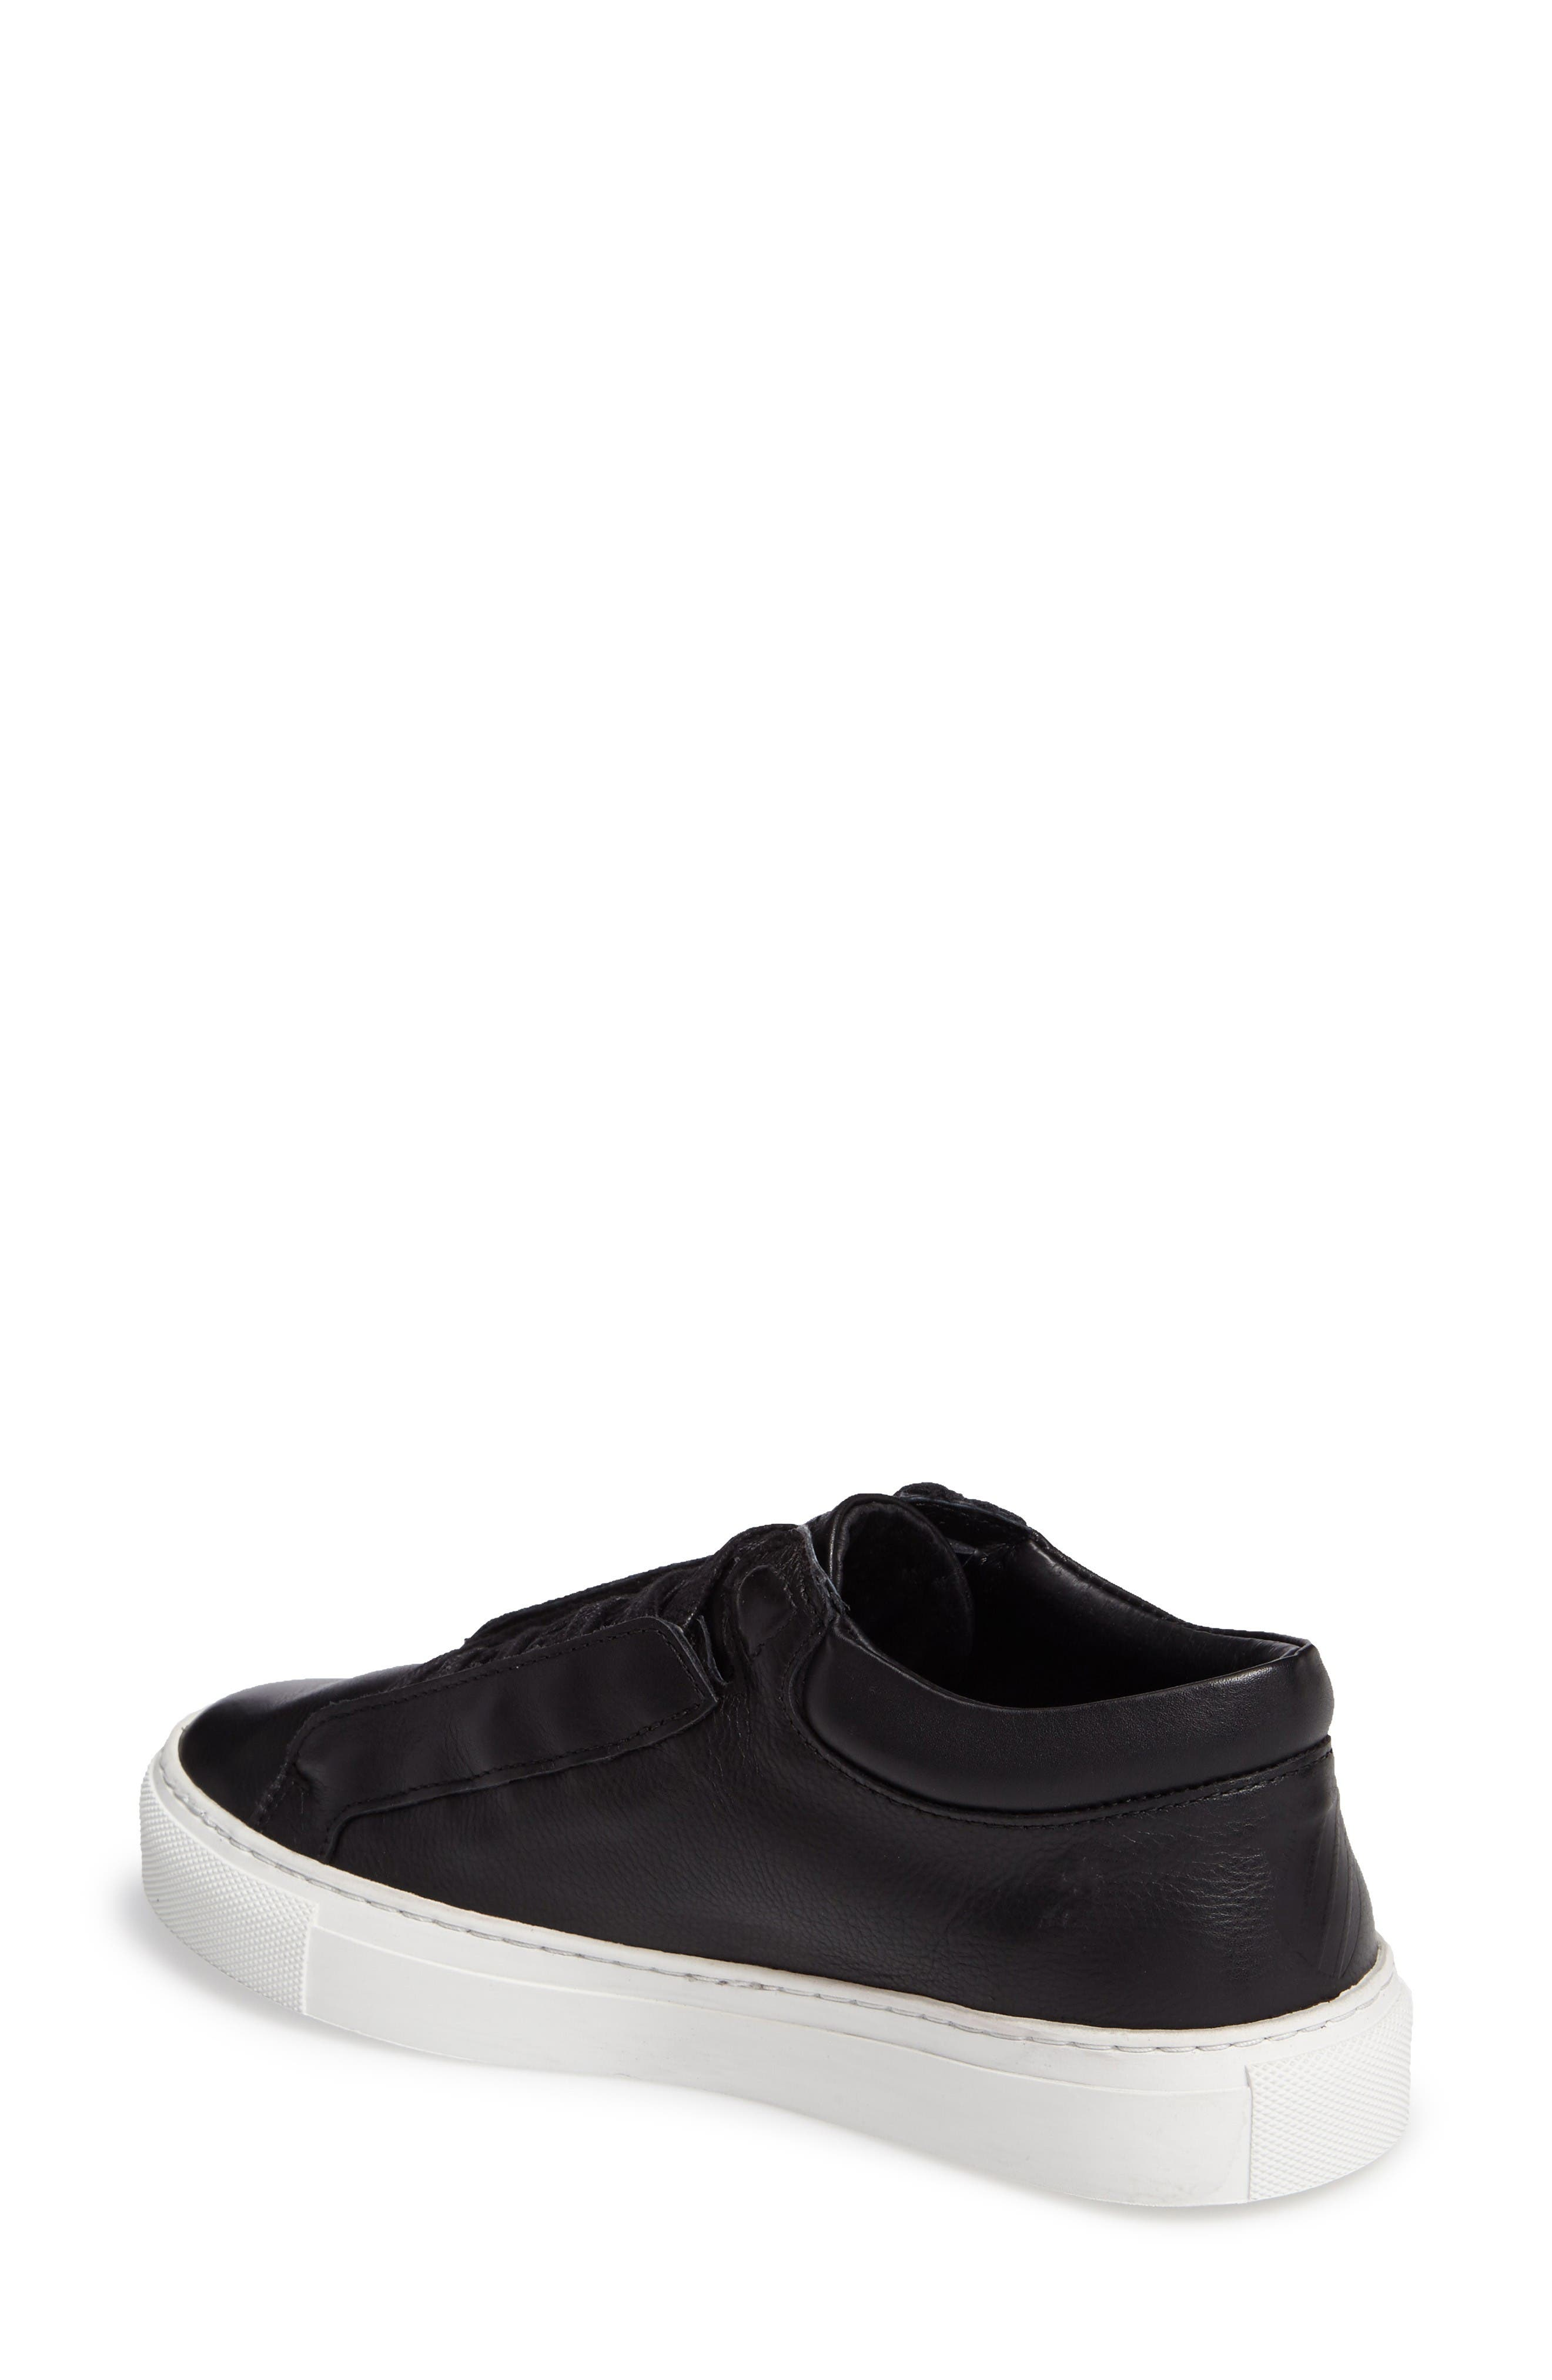 Novo Demi Sneaker,                             Alternate thumbnail 2, color,                             Black/ Off White